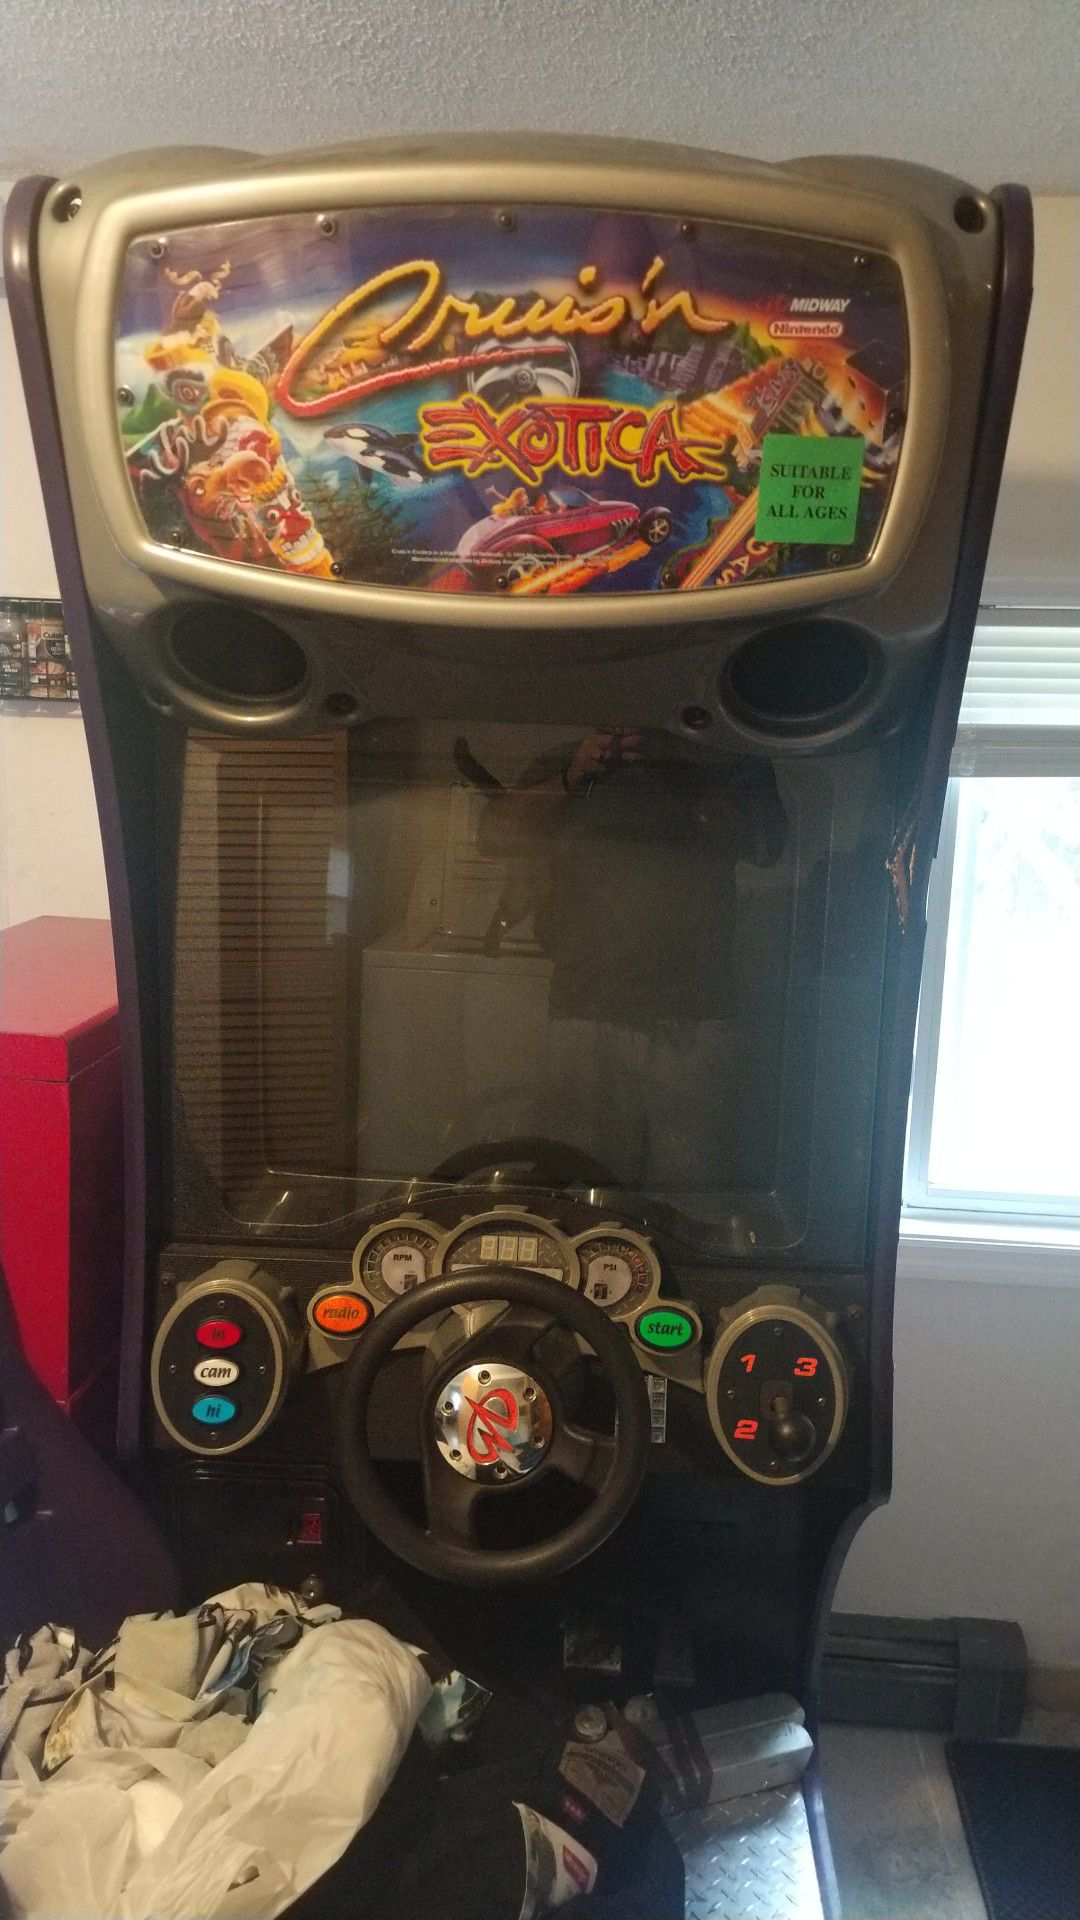 Cruisin Exotica original arcade with driver seat